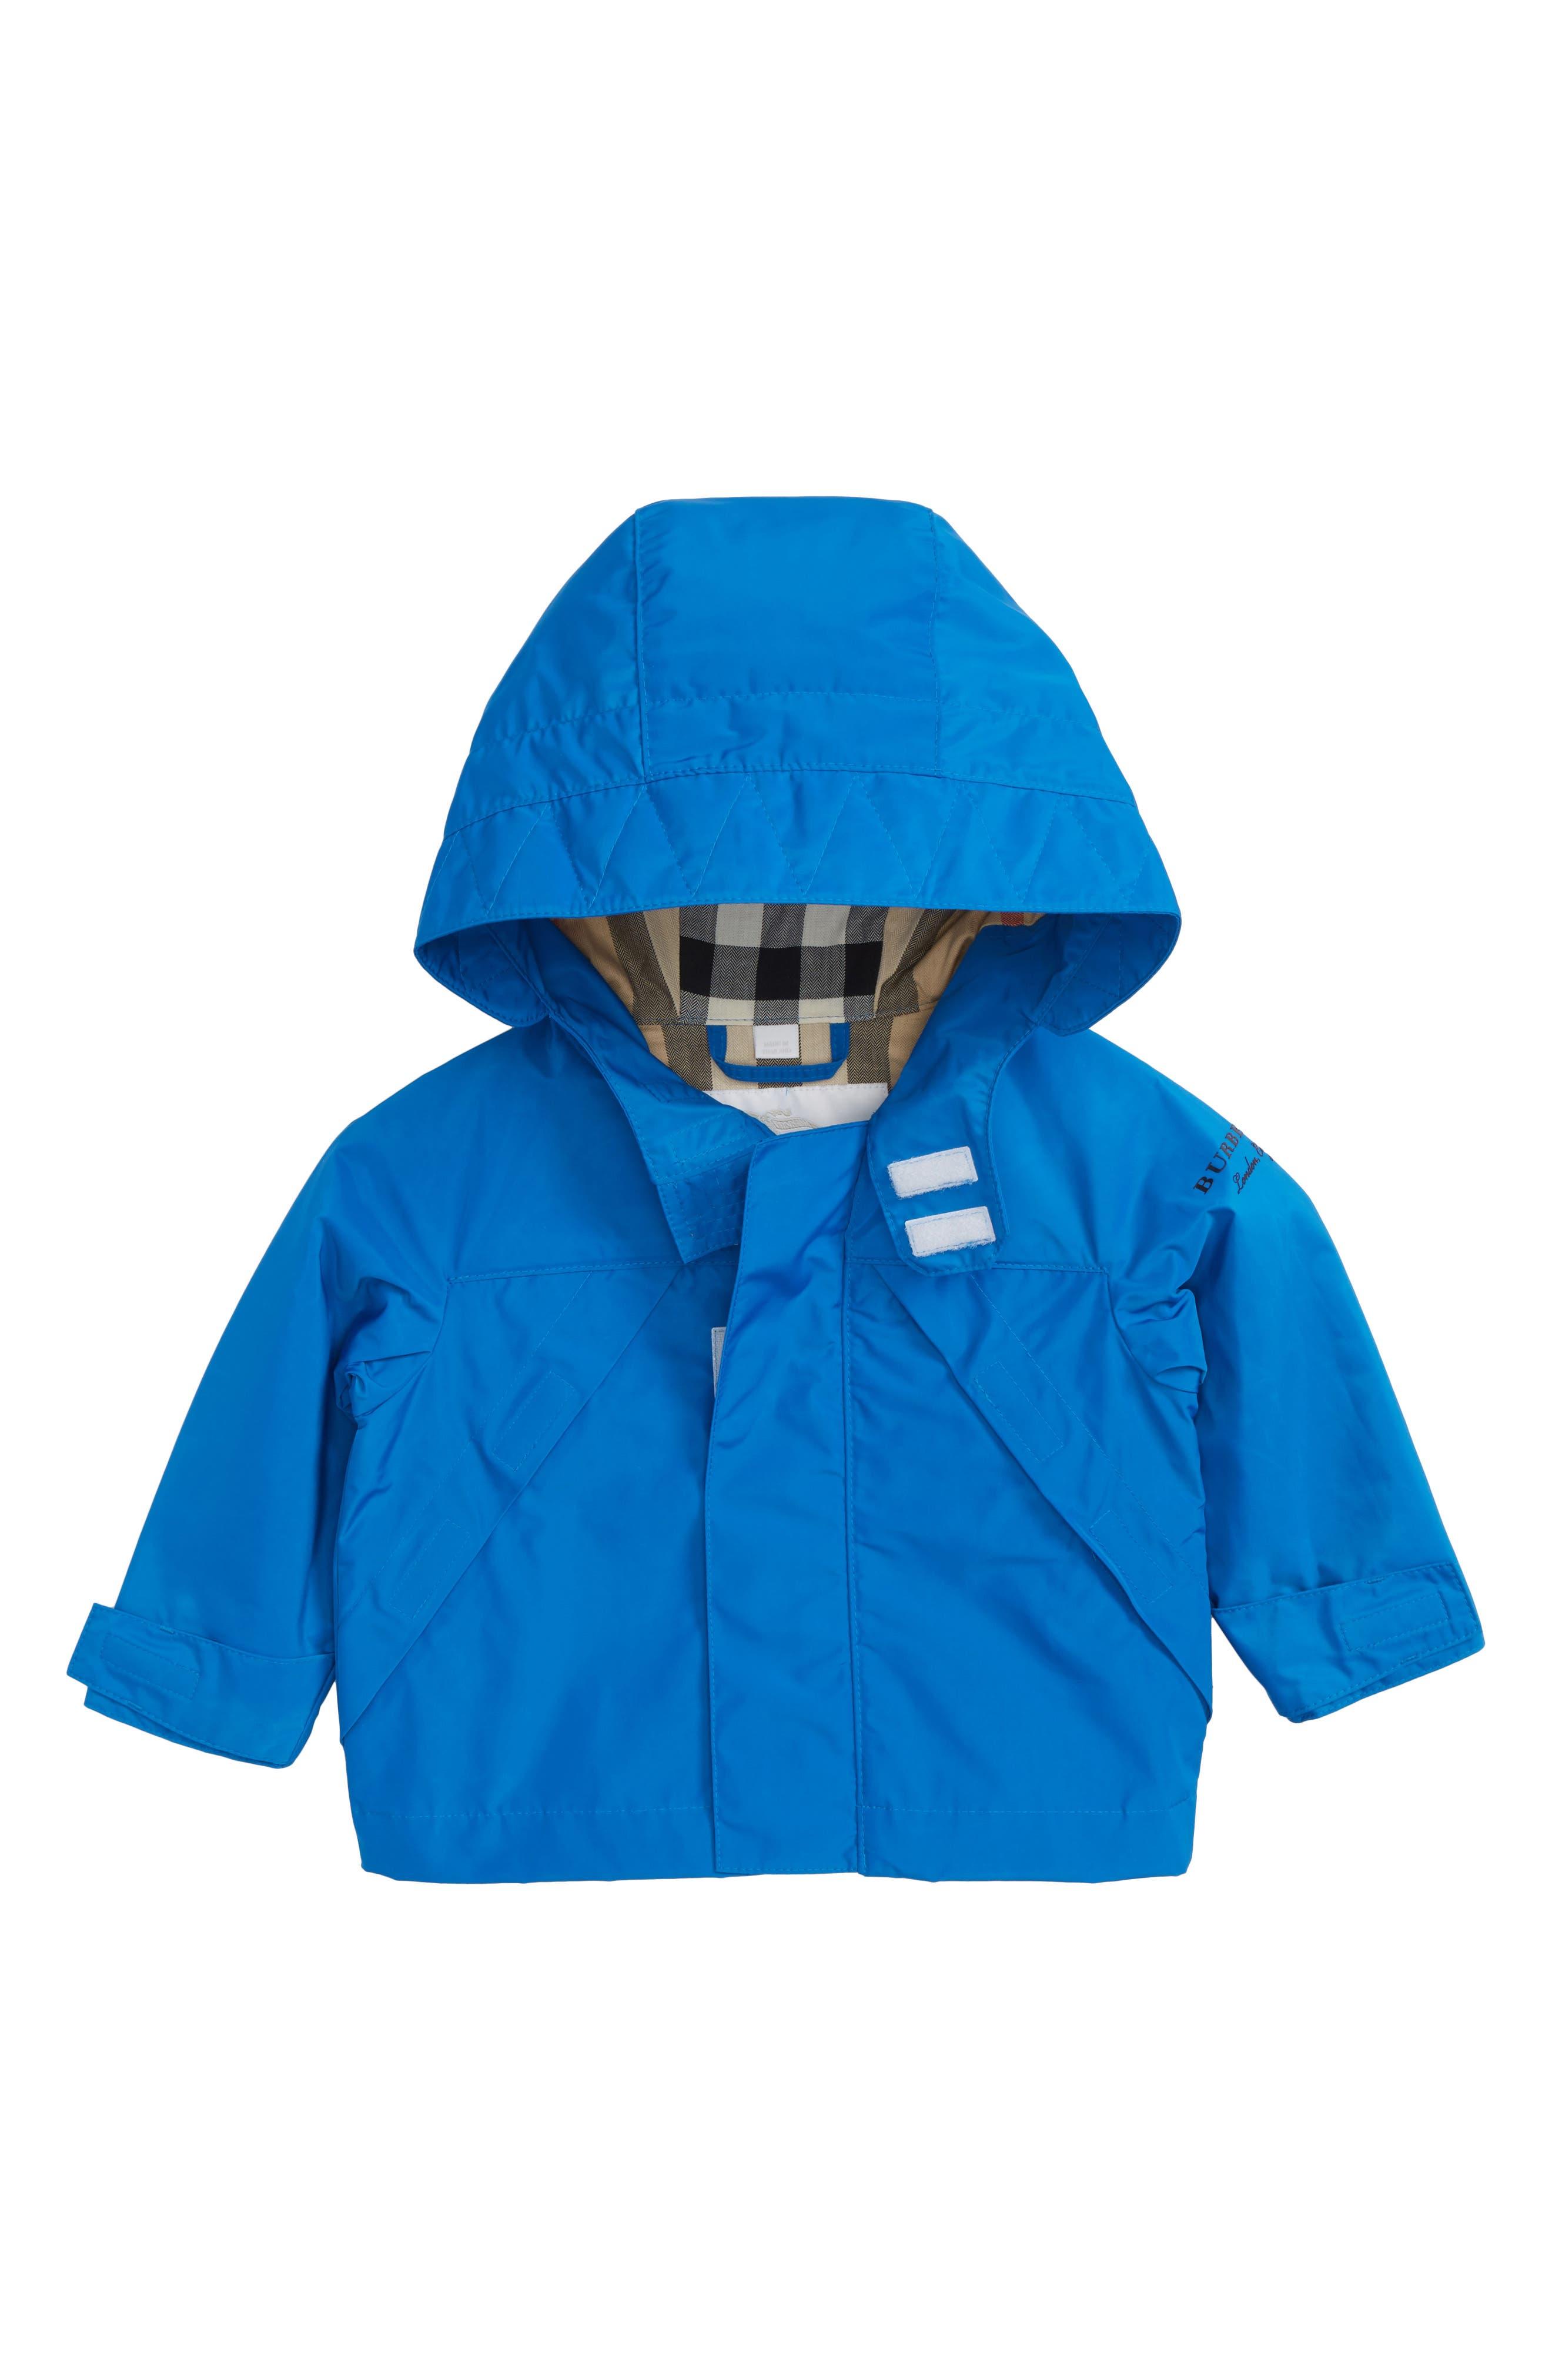 Yeoman Hooded Windbreaker Jacket,                             Main thumbnail 1, color,                             420